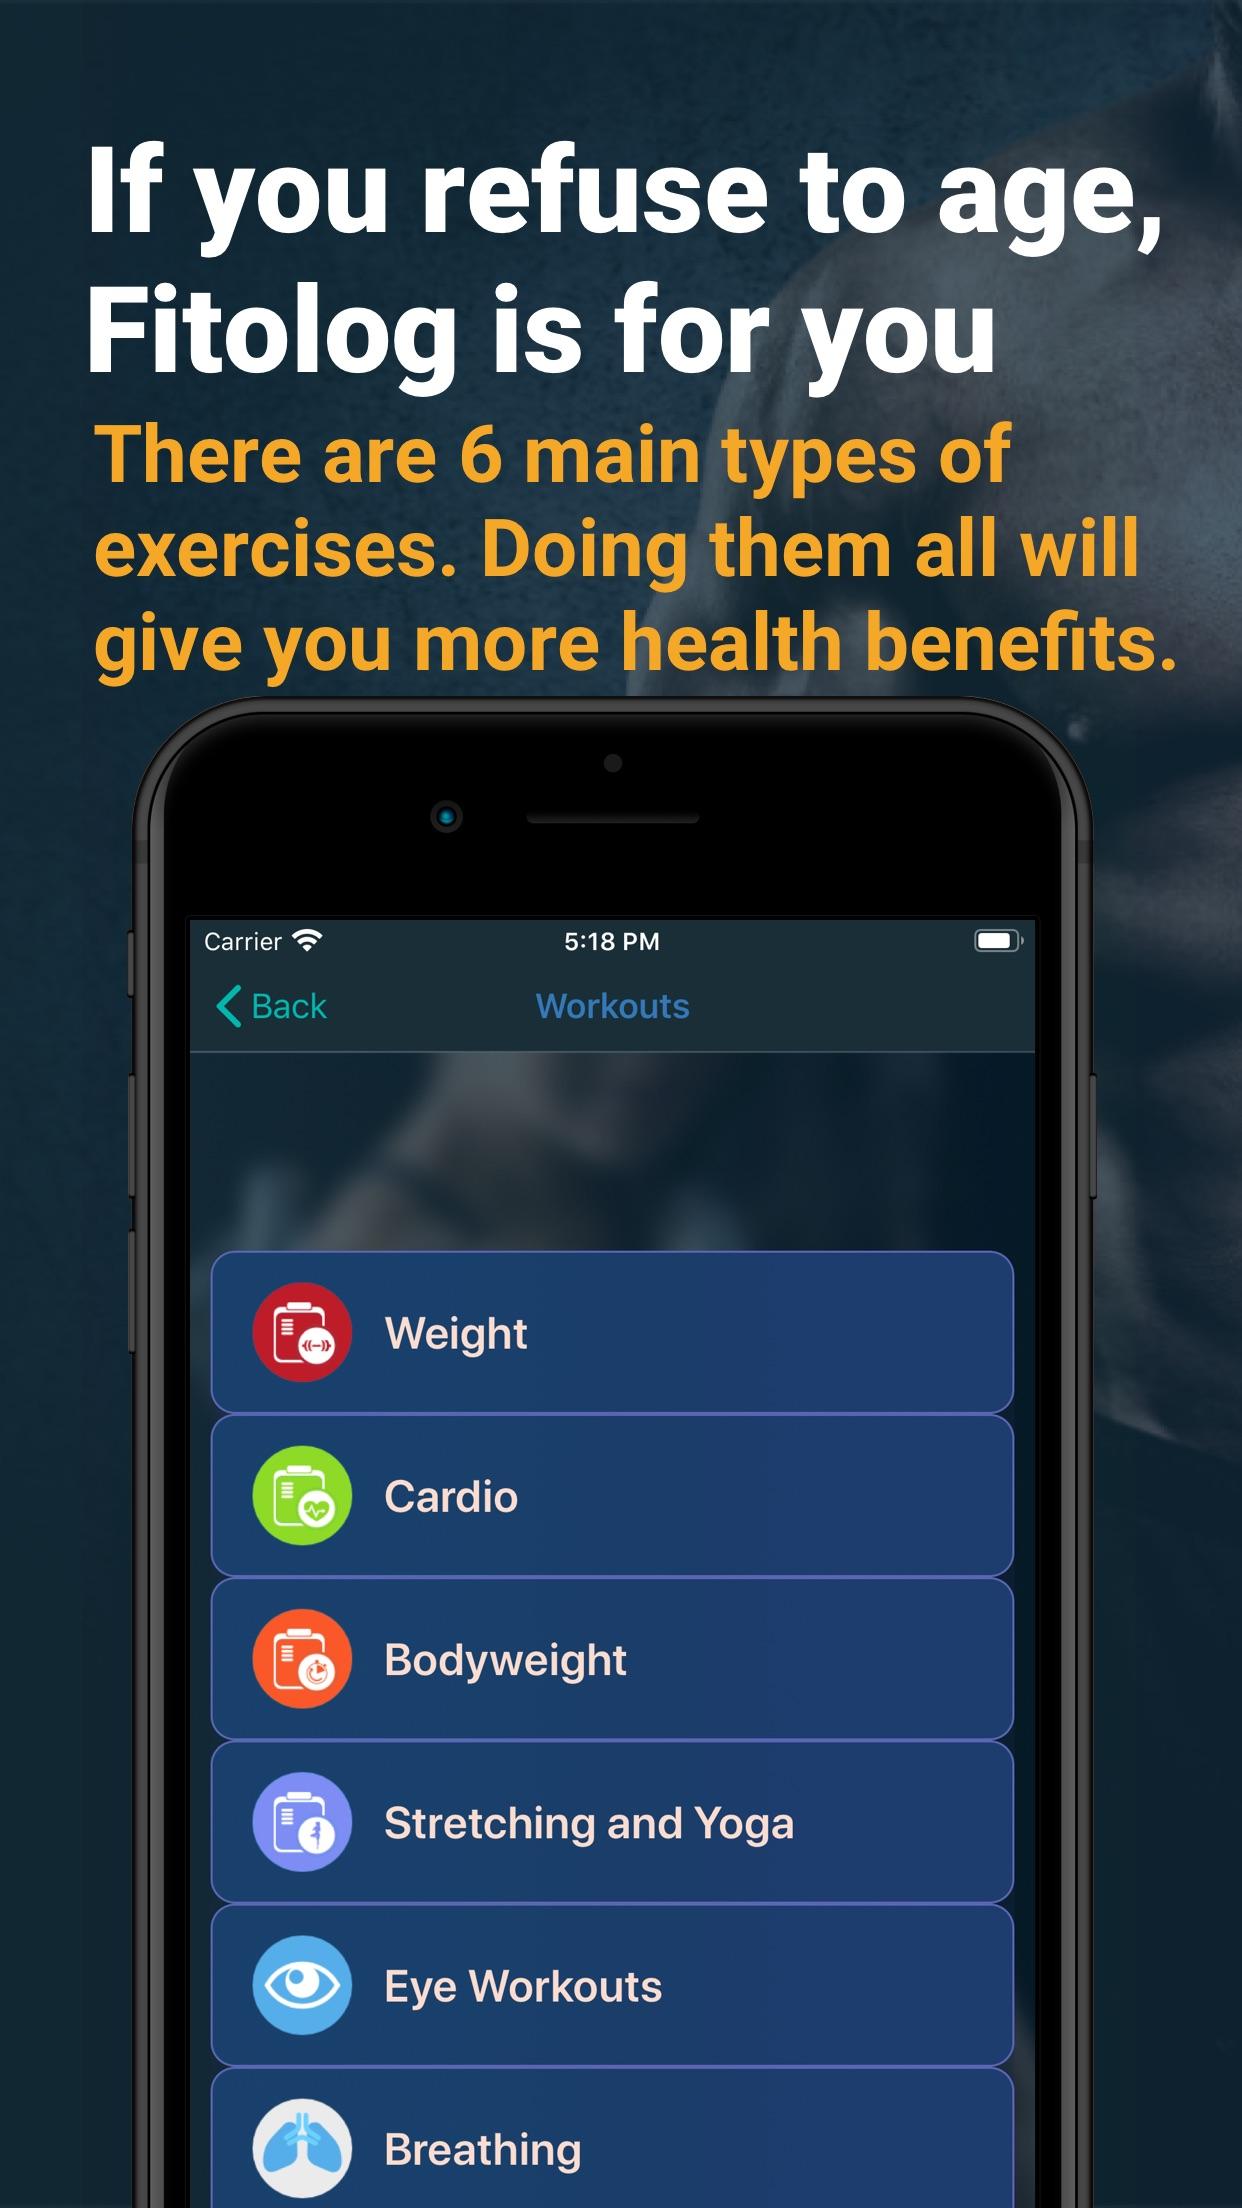 Fitolog - Fitness Activity Screenshot